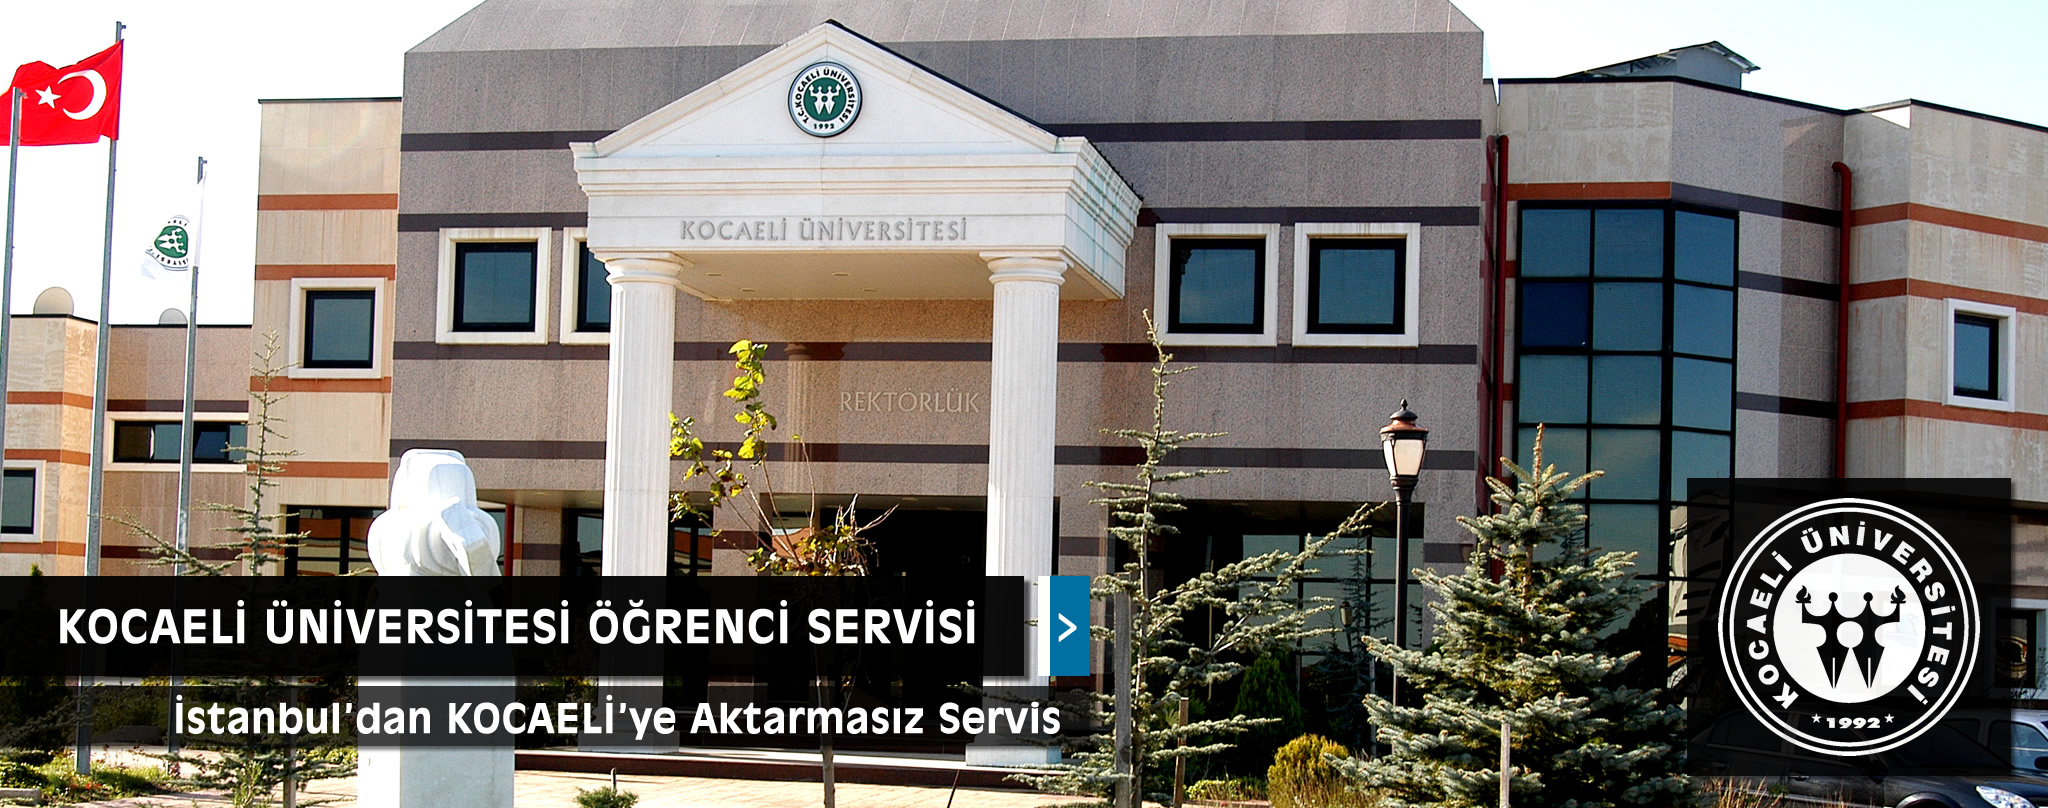 kocaeli-üniversitesi-servis